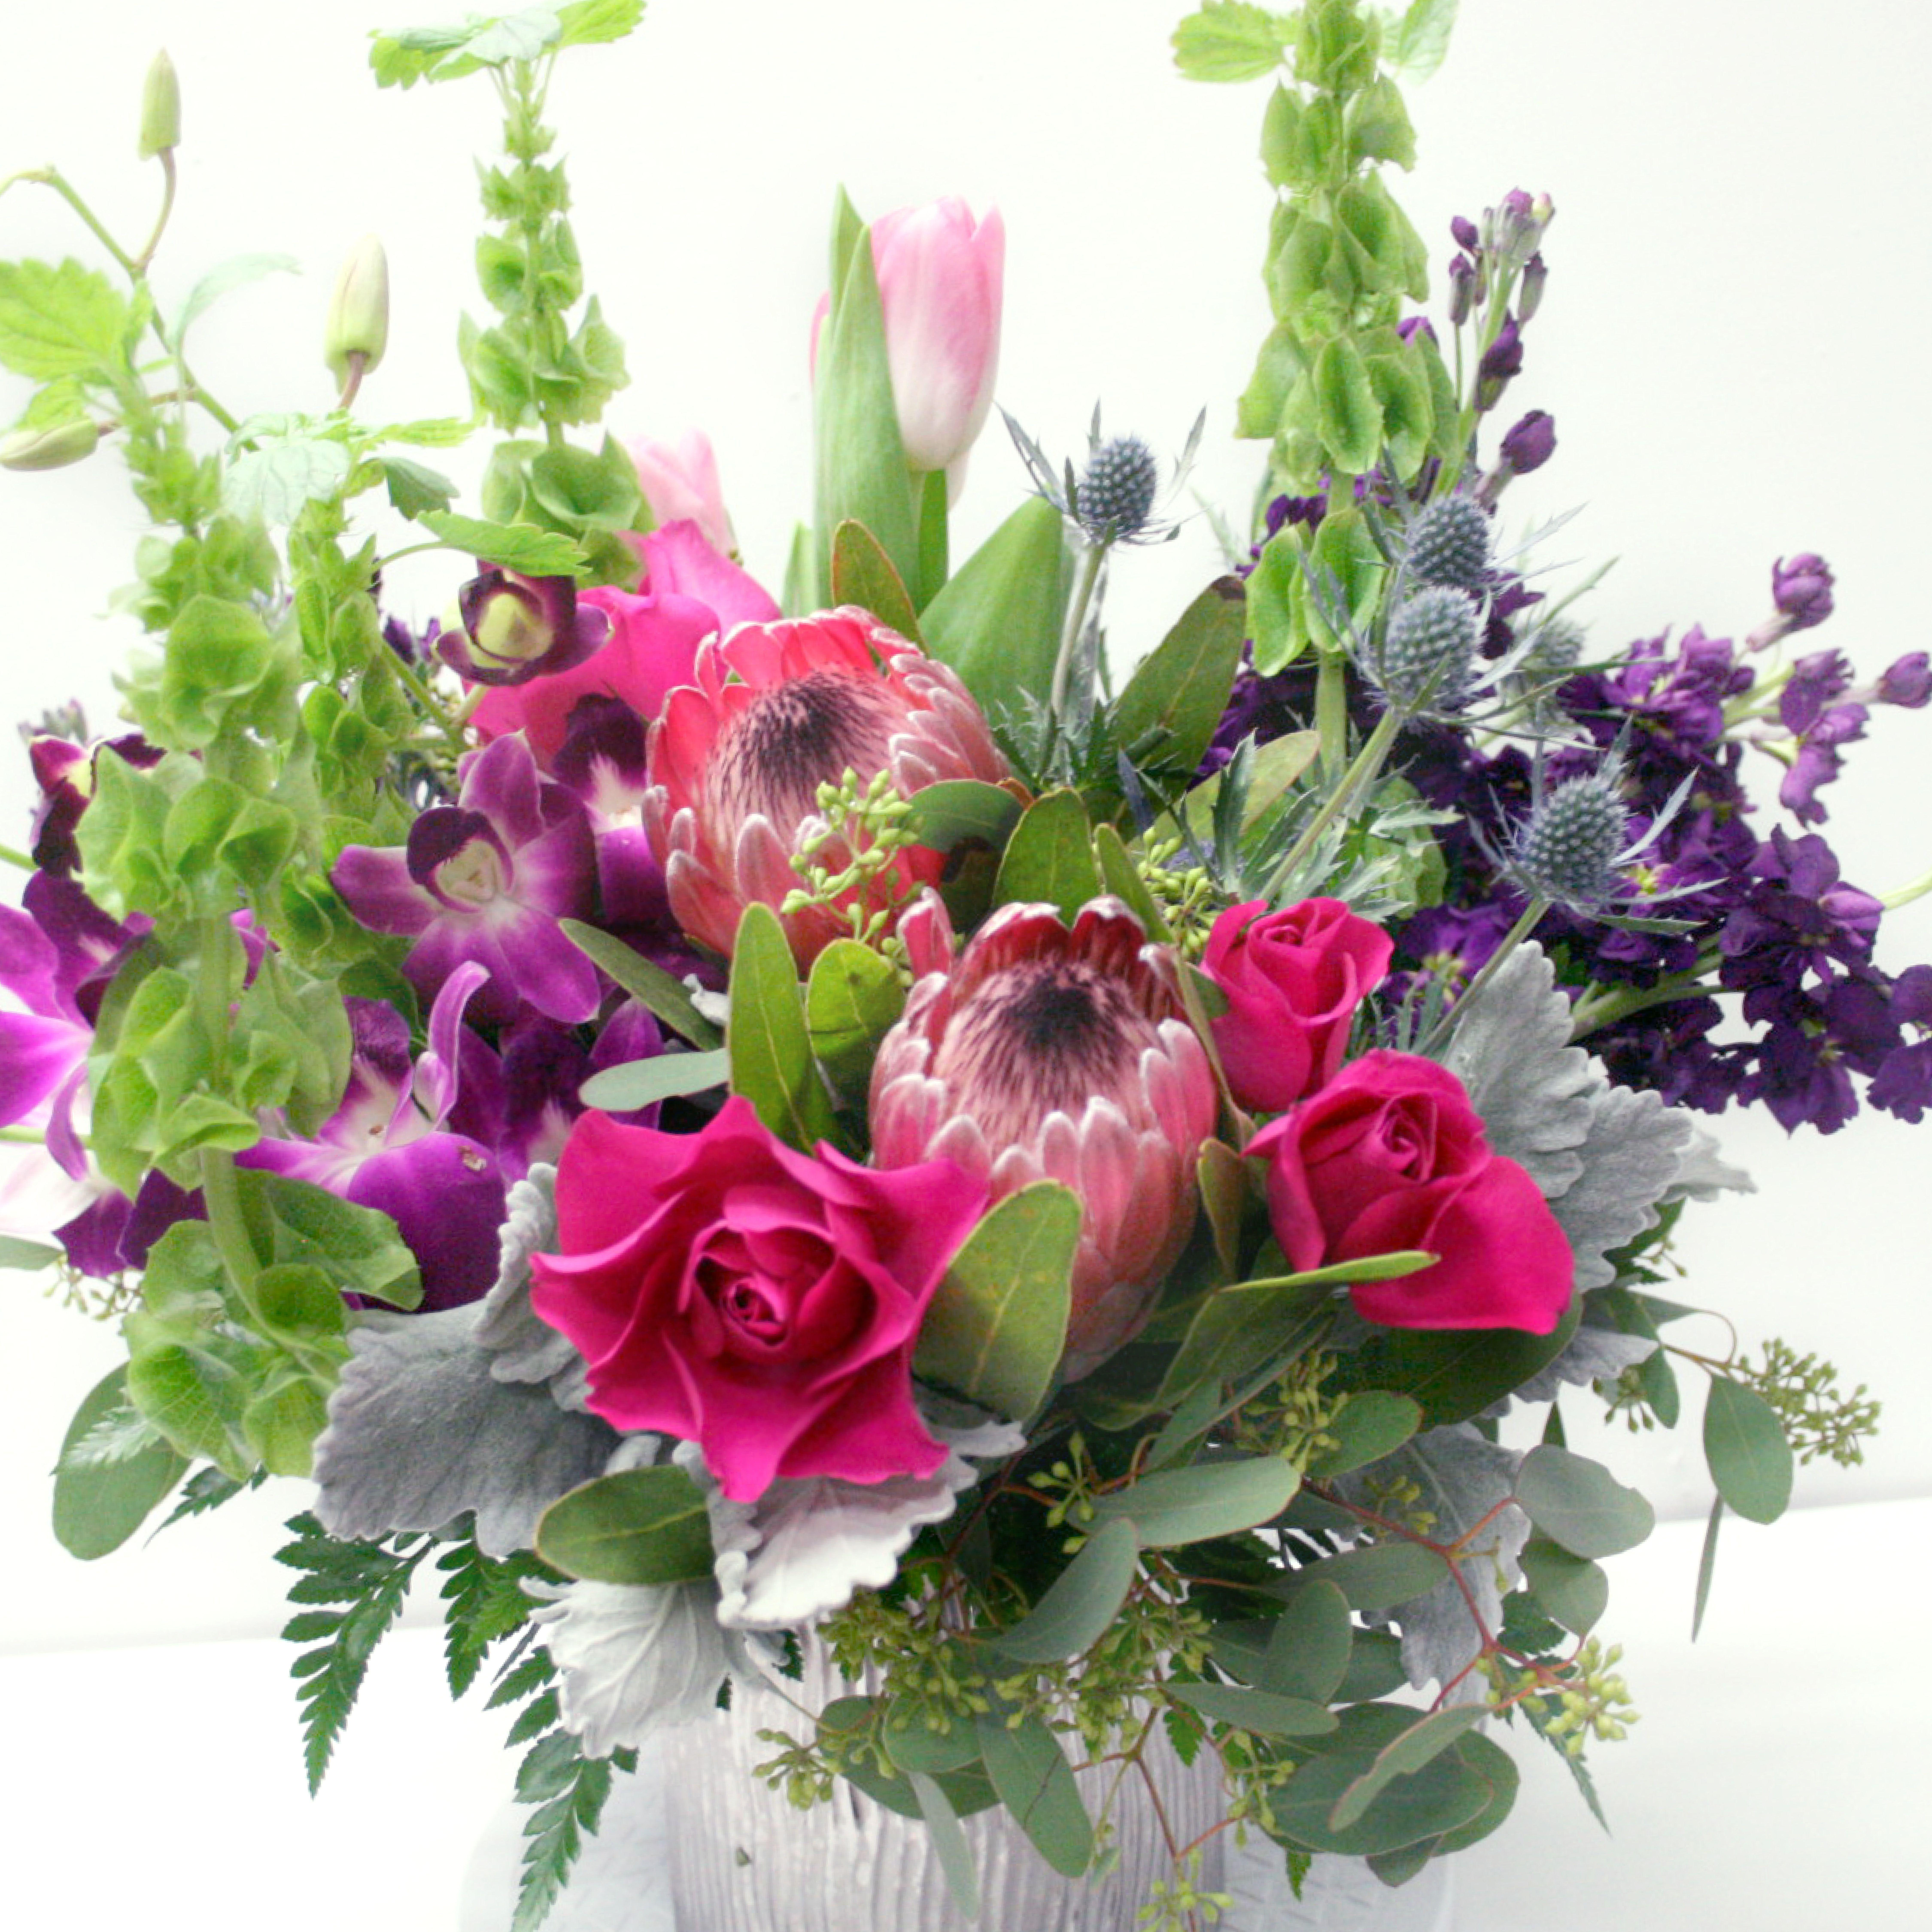 Summer Style Arrangement Freytag's Florist Austin, TX